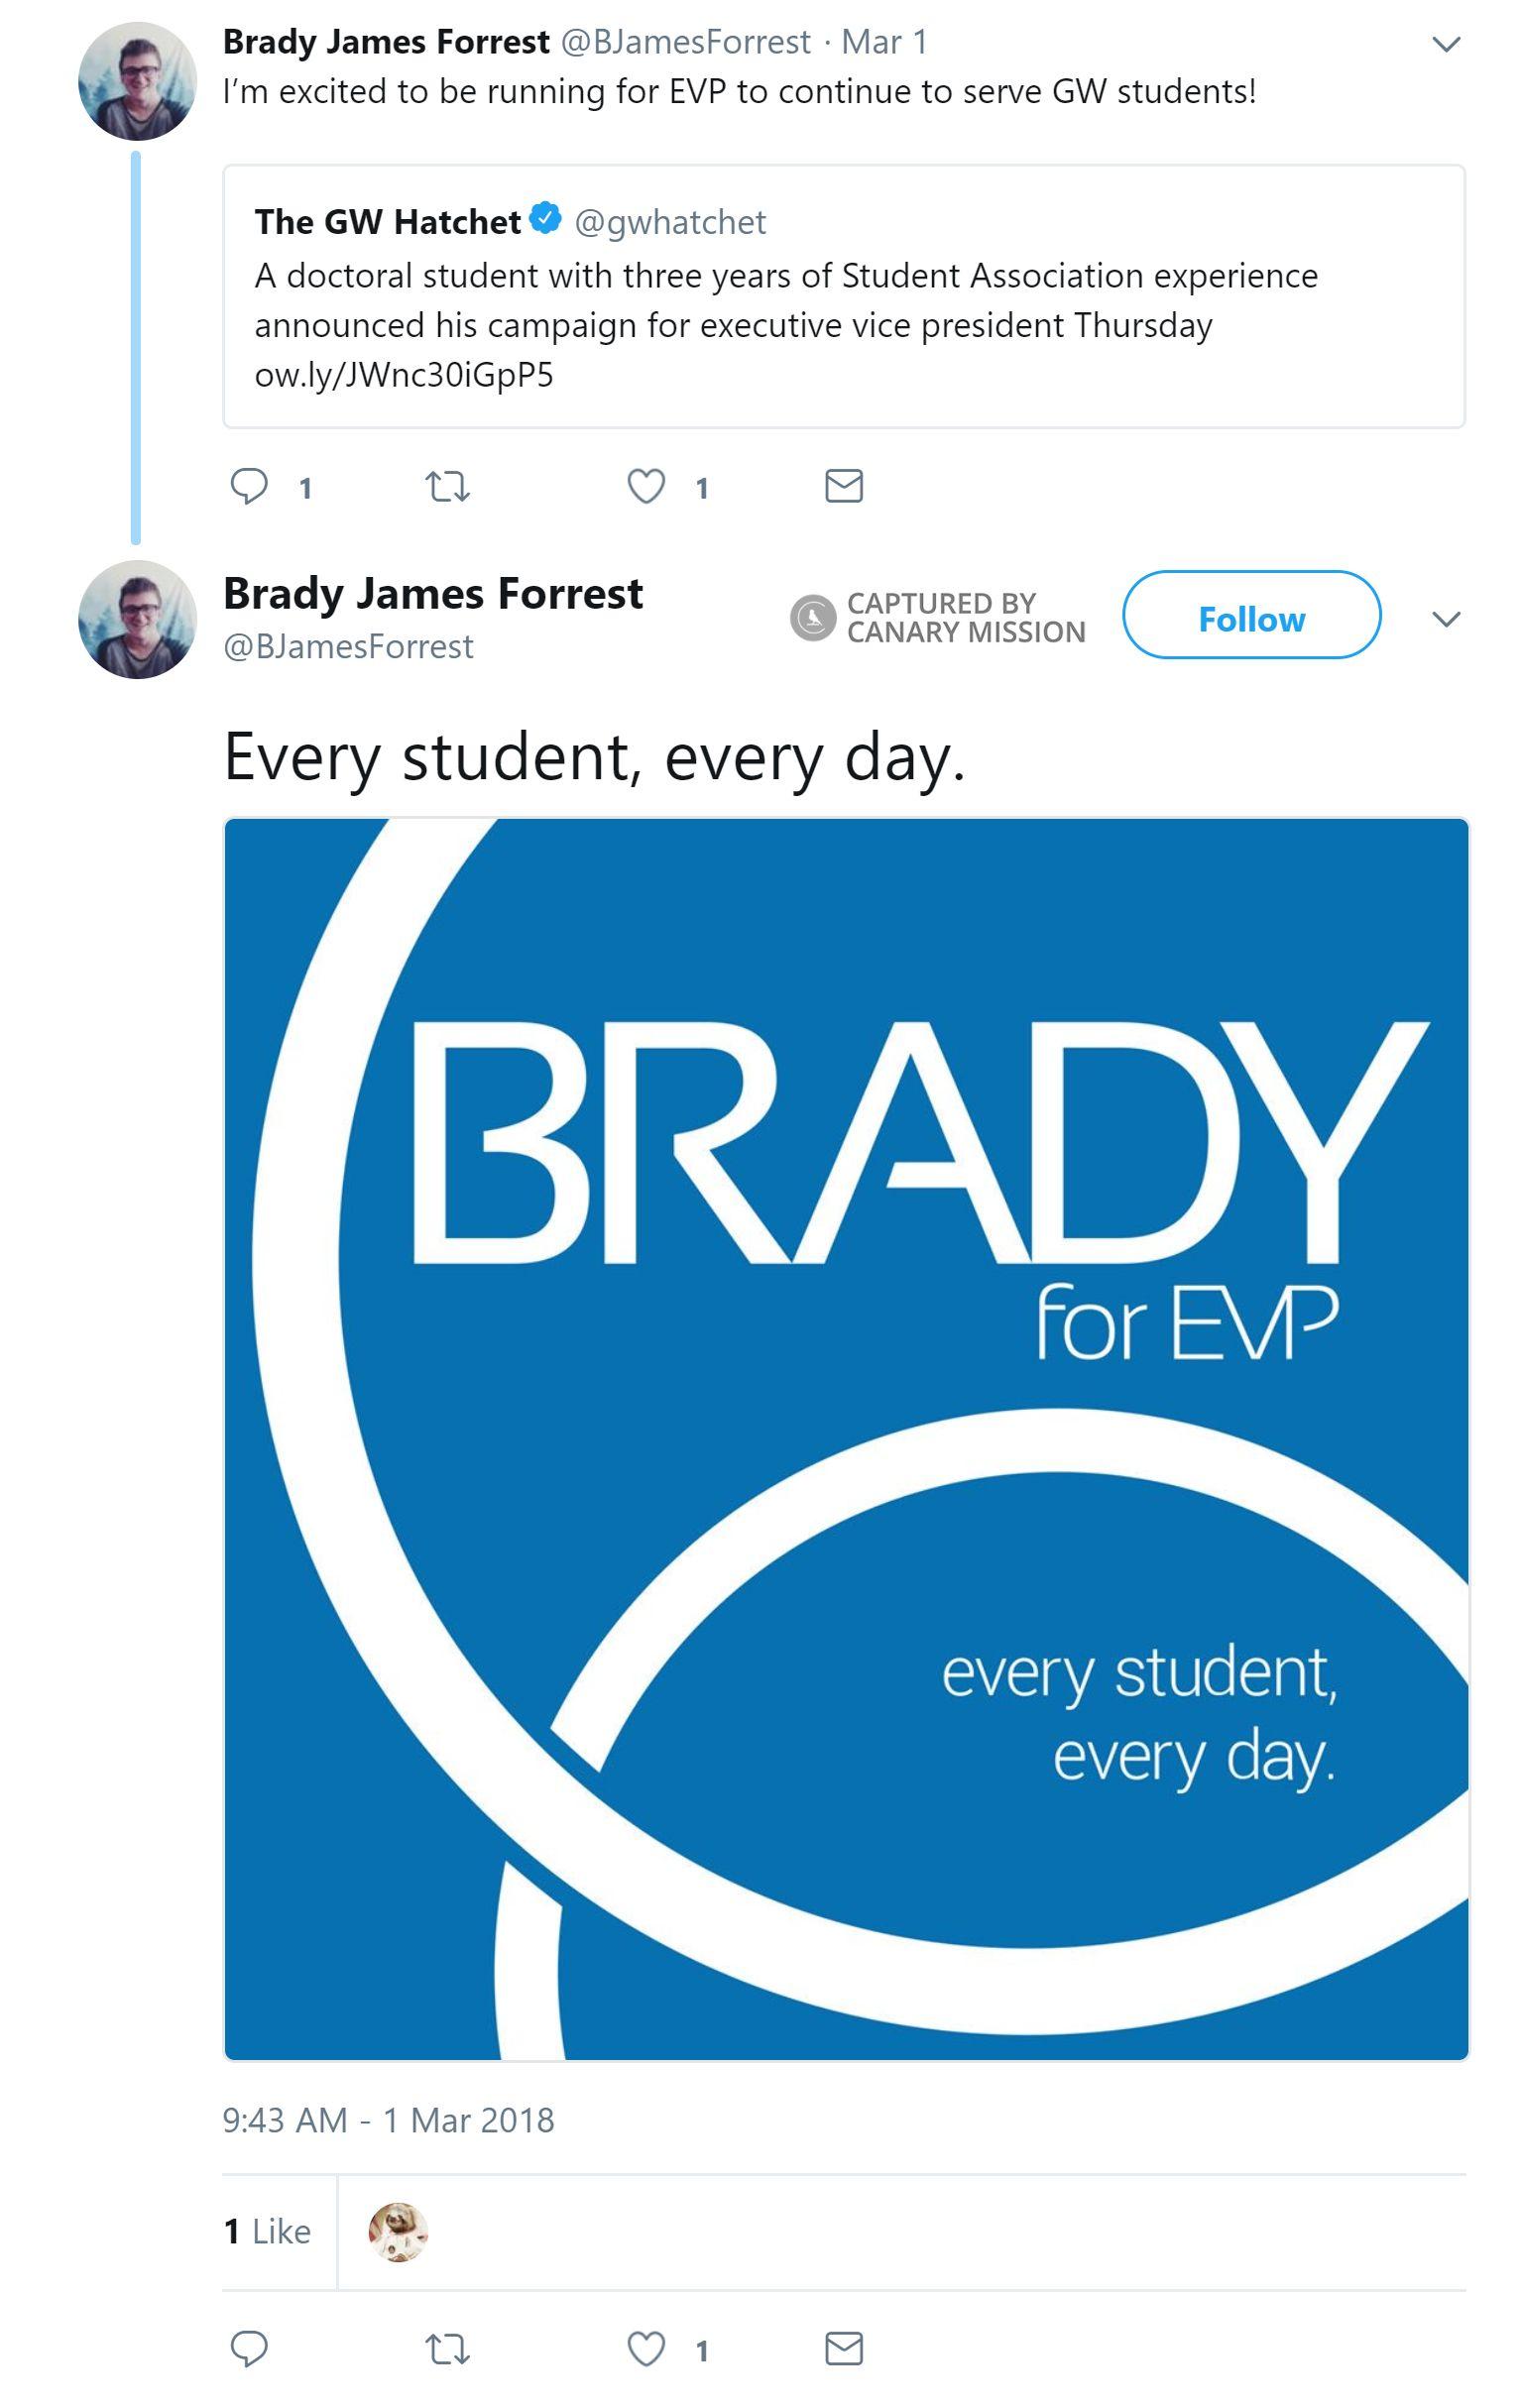 Brady Forrest - Canary Mission